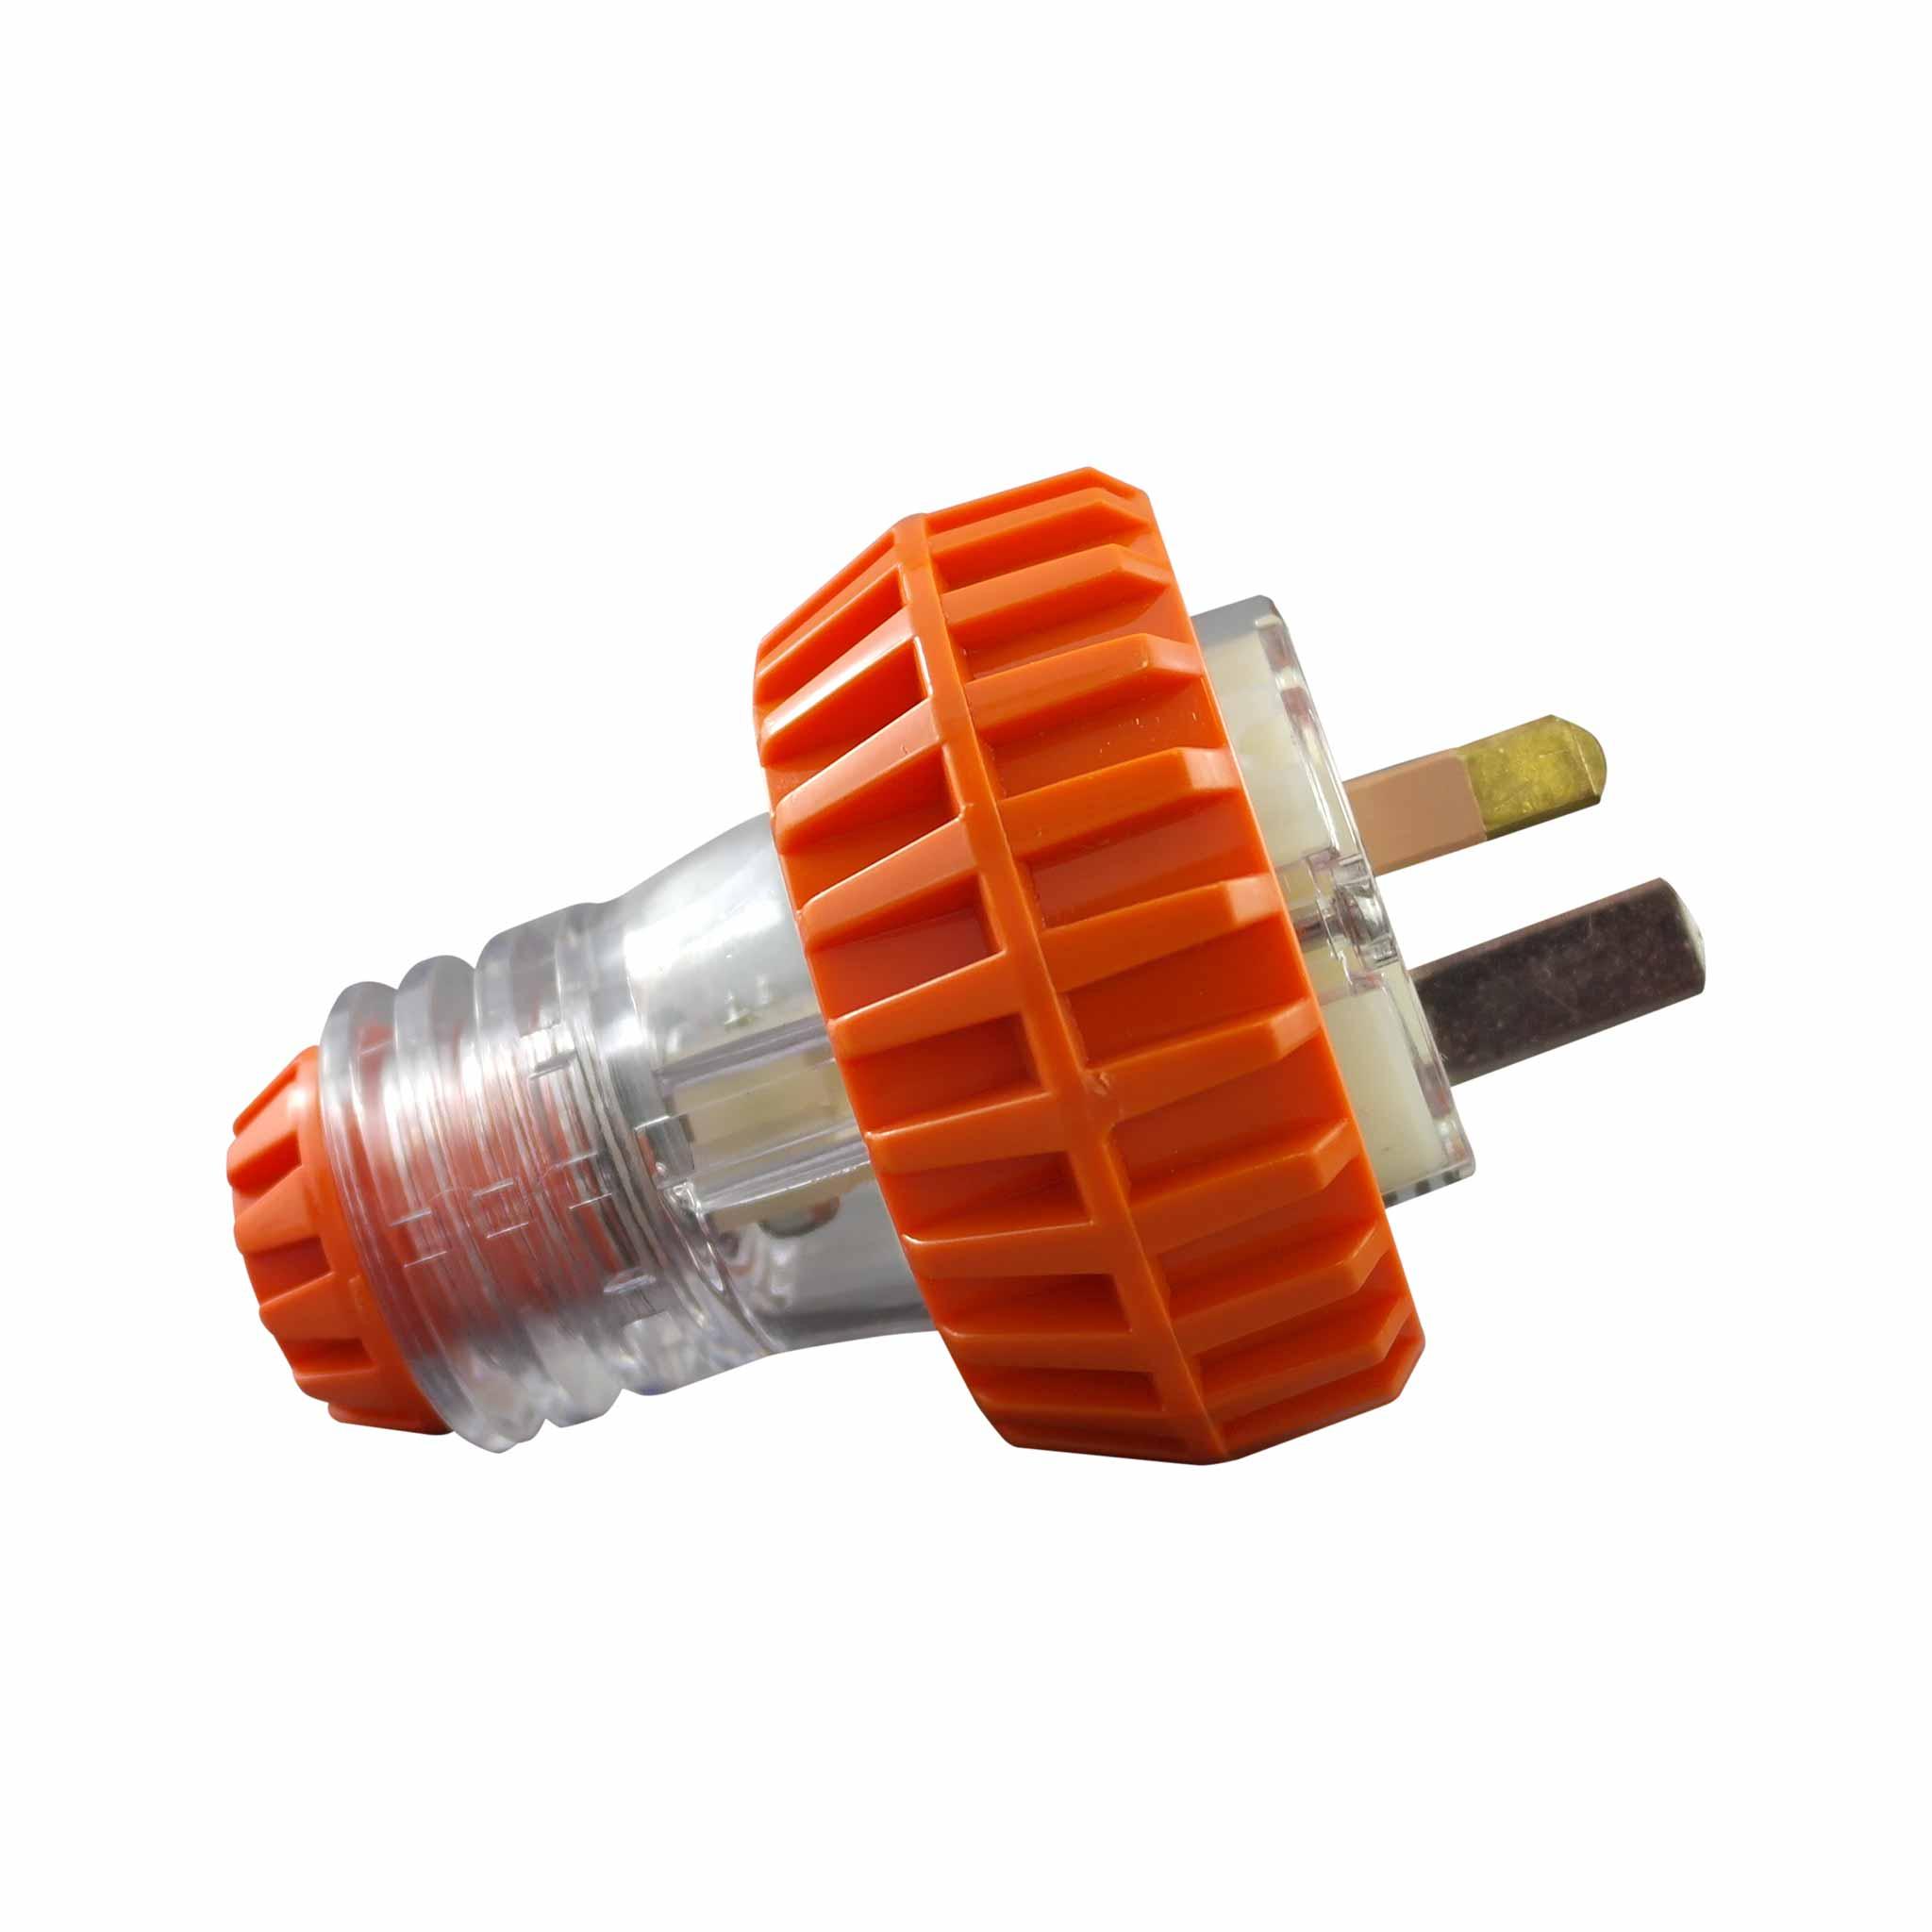 Straight Plug 15A 3 Pin Flat 250V AC IP66